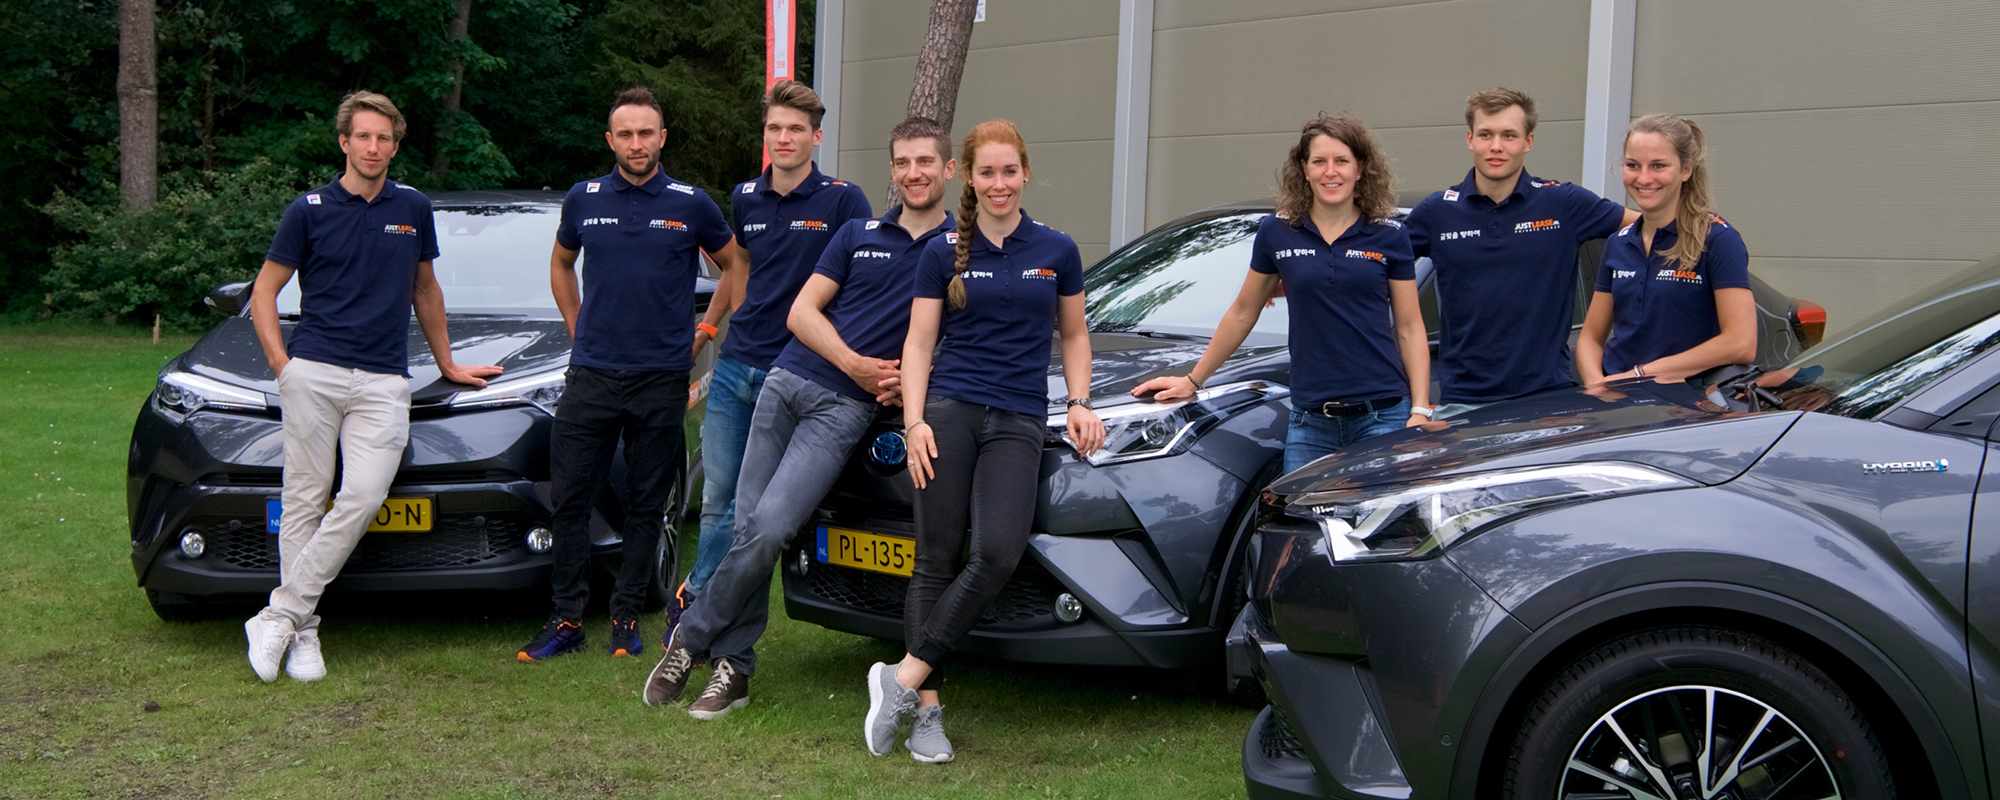 Topschaatsers Team JustLease.nl stappen in hybride Toyota's